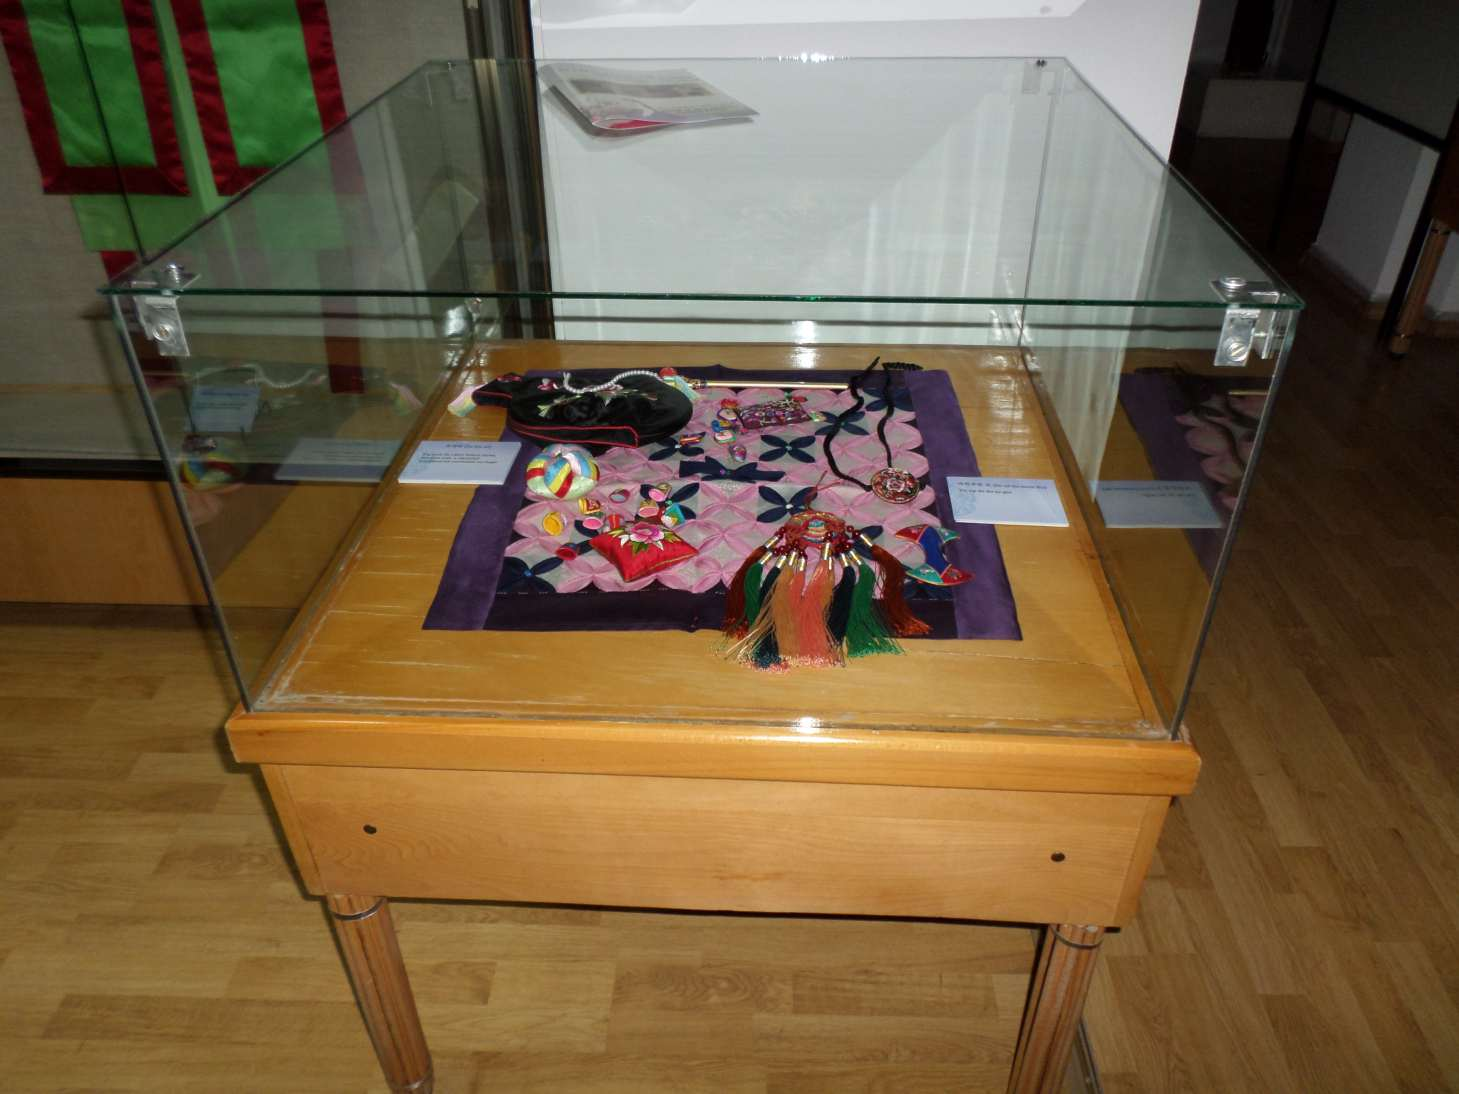 poze expozitia temporara costumul traditional coreean muzeul de arta populara constanta